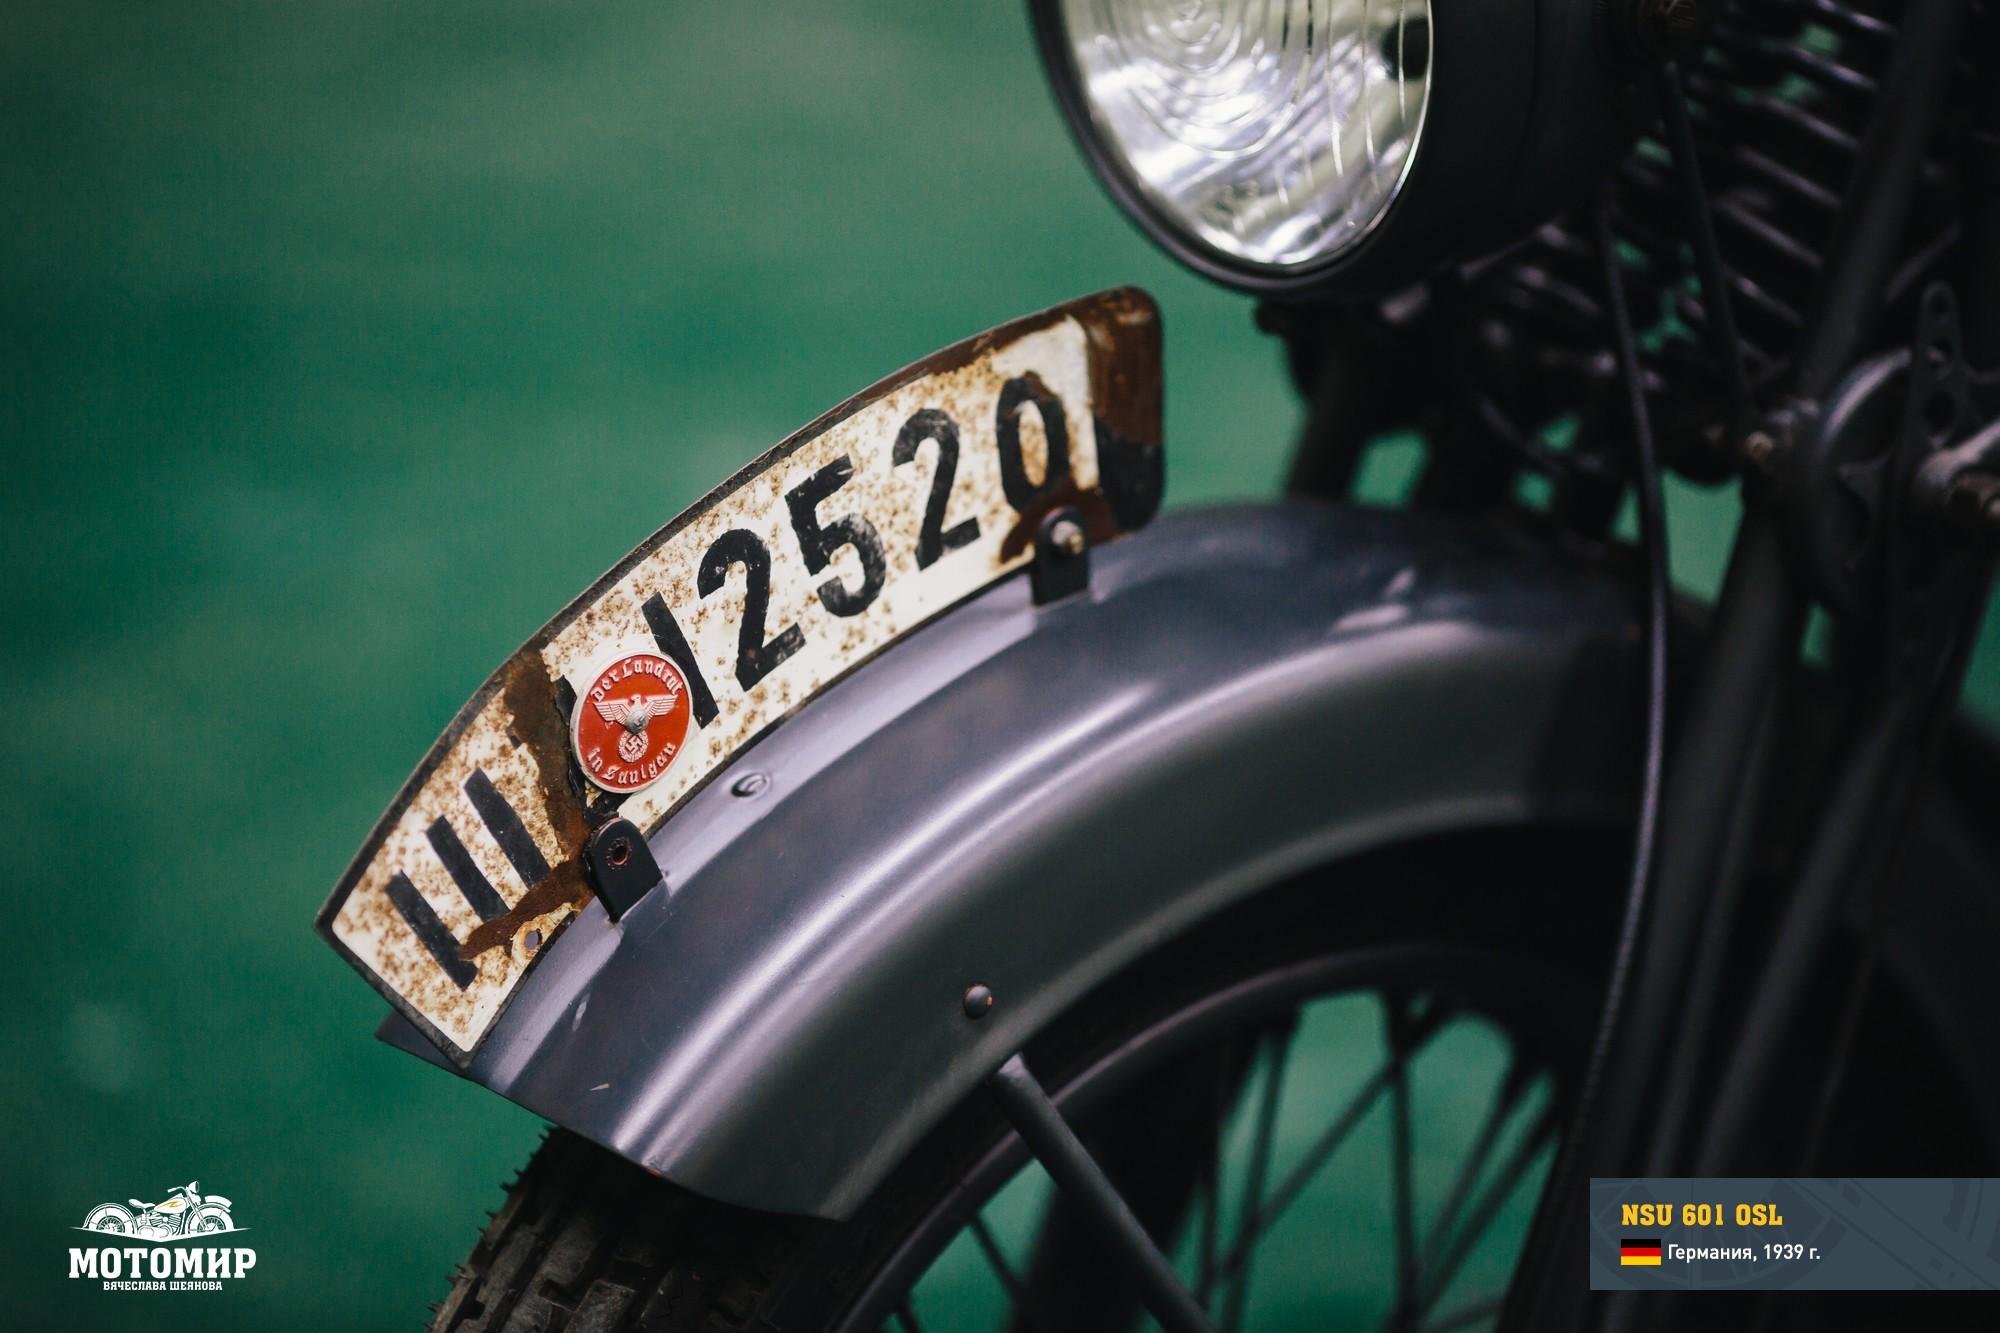 nsu-601-osl-201512-web-12